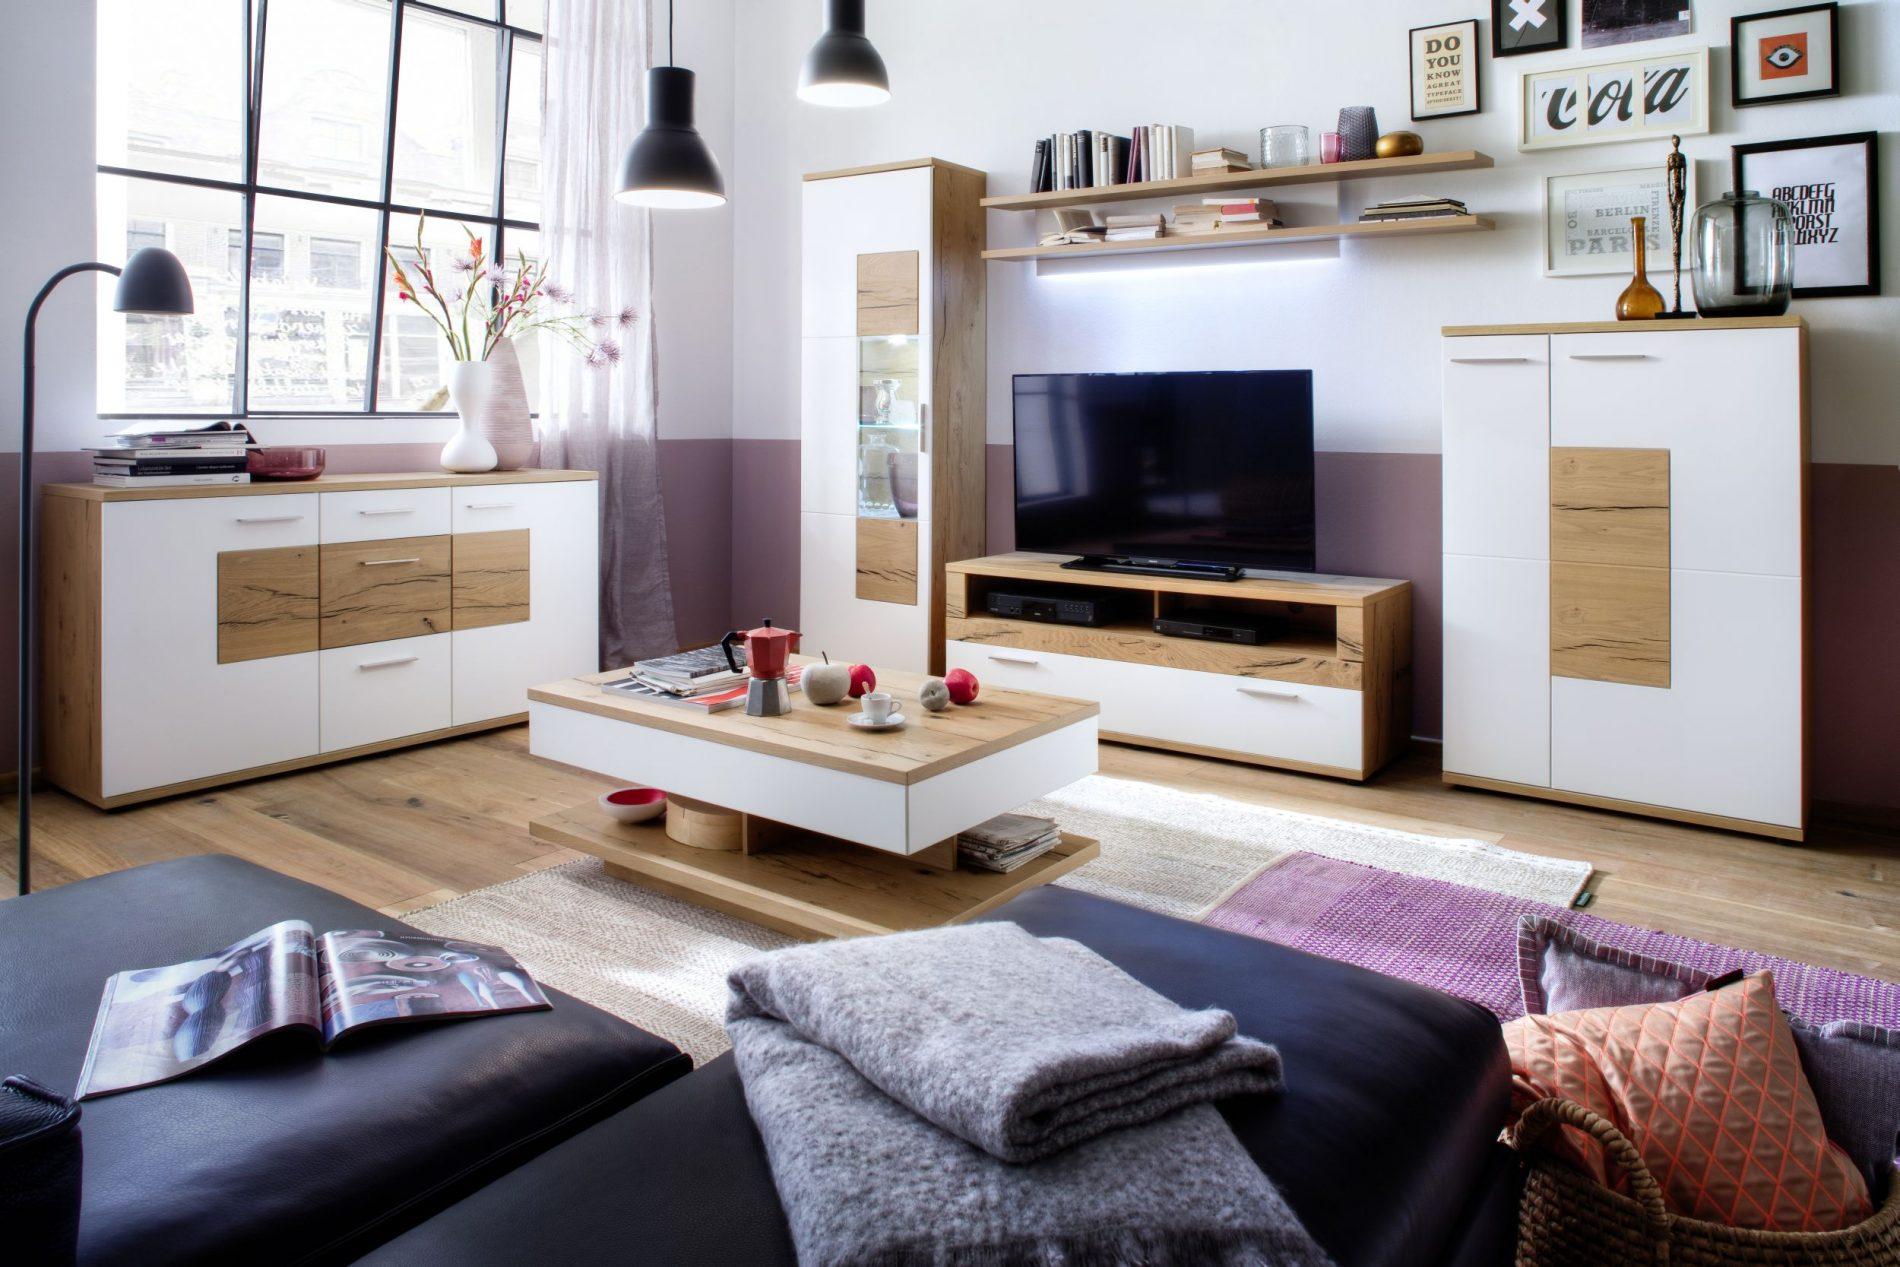 Top 10 Brands to Buy Living Room Furniture Online & Instore